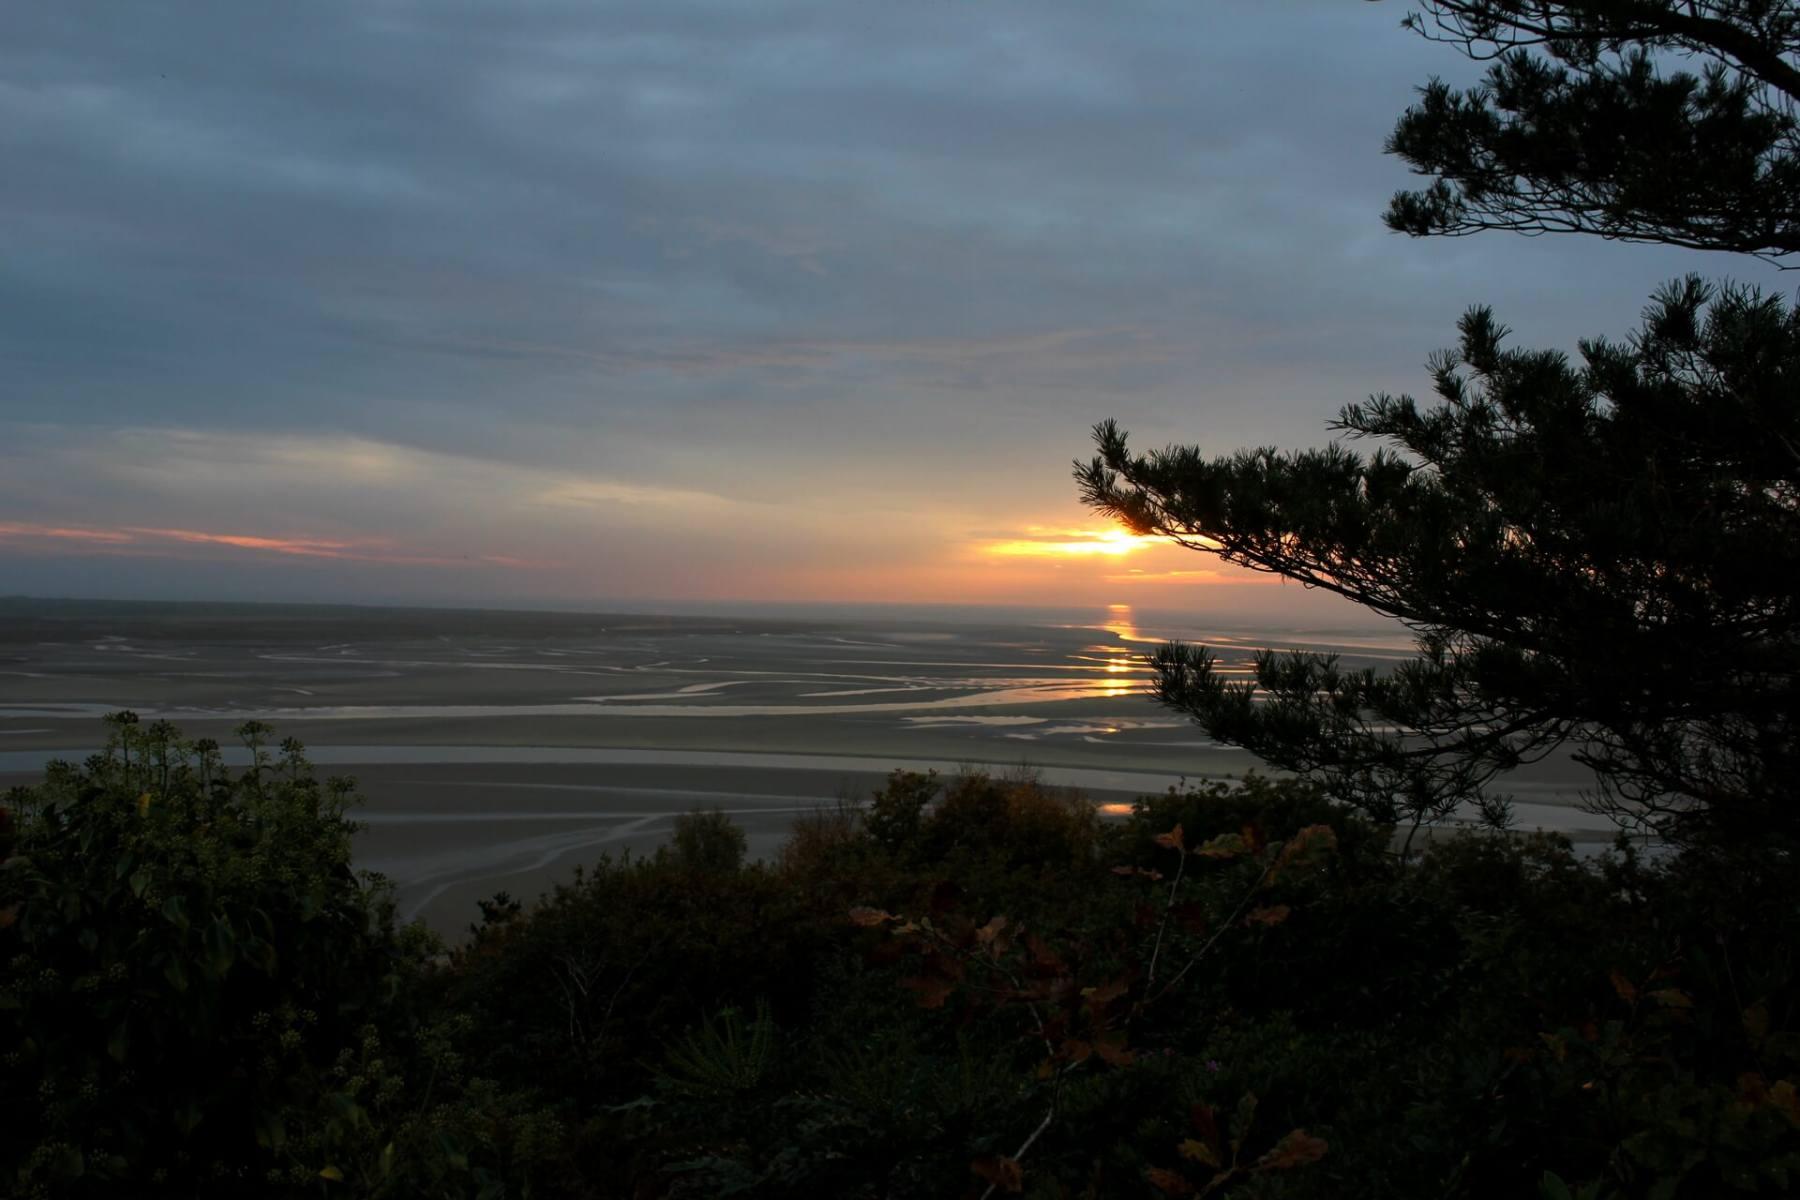 sunset-at-portmeirion